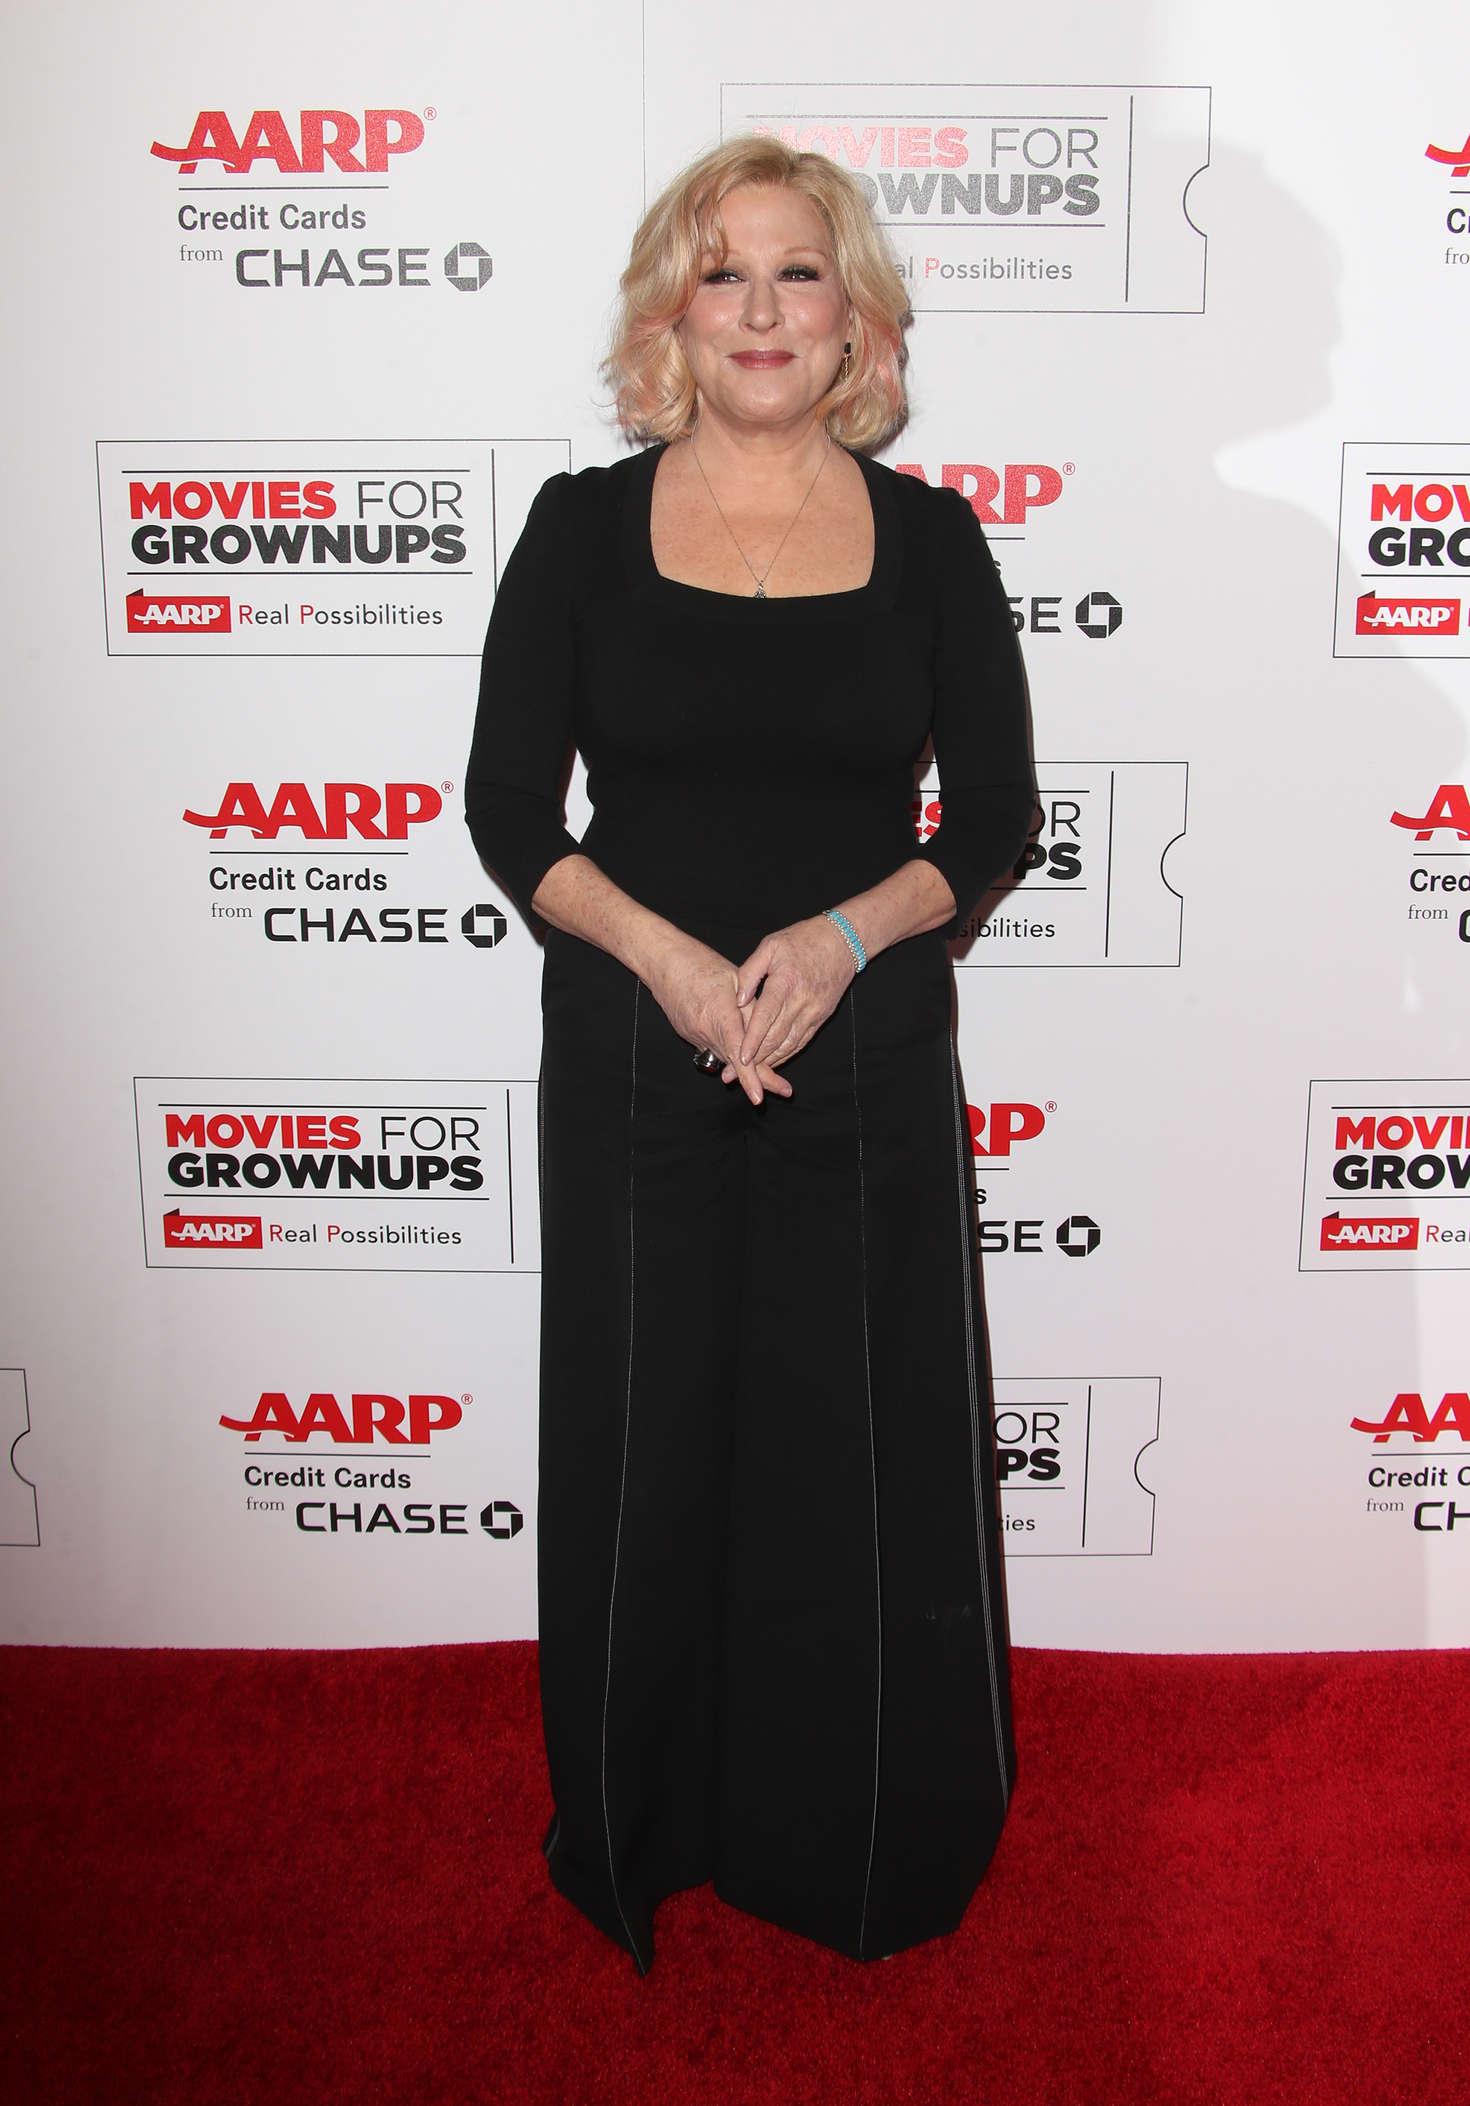 Bette Midler 2016 : Bette Midler: AARPs Movie For GrownUps Awards -07